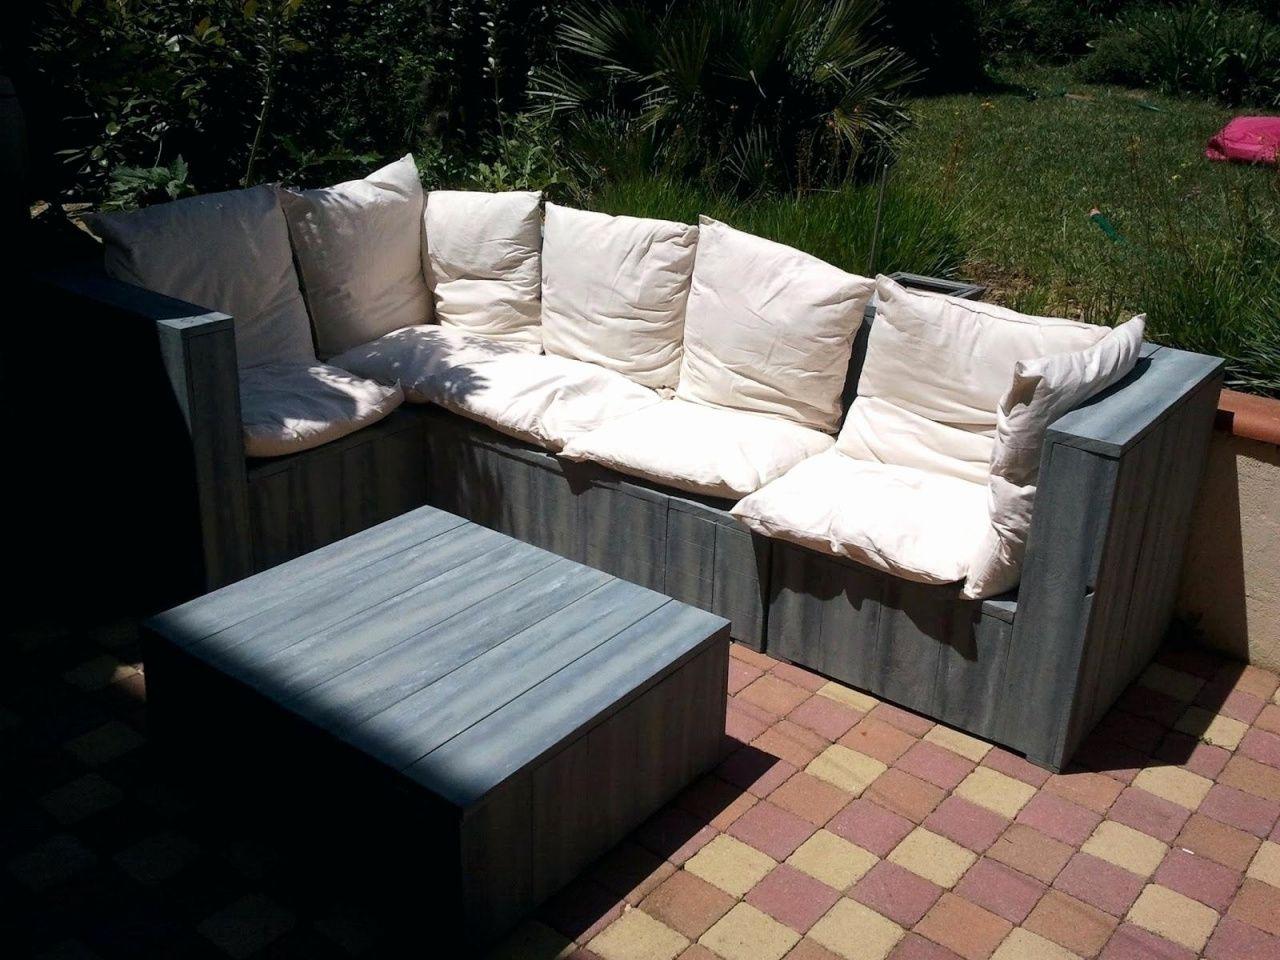 77 Salon Jardin Resine Carrefour Outdoor Sectional Outdoor Decor Outdoor Furniture